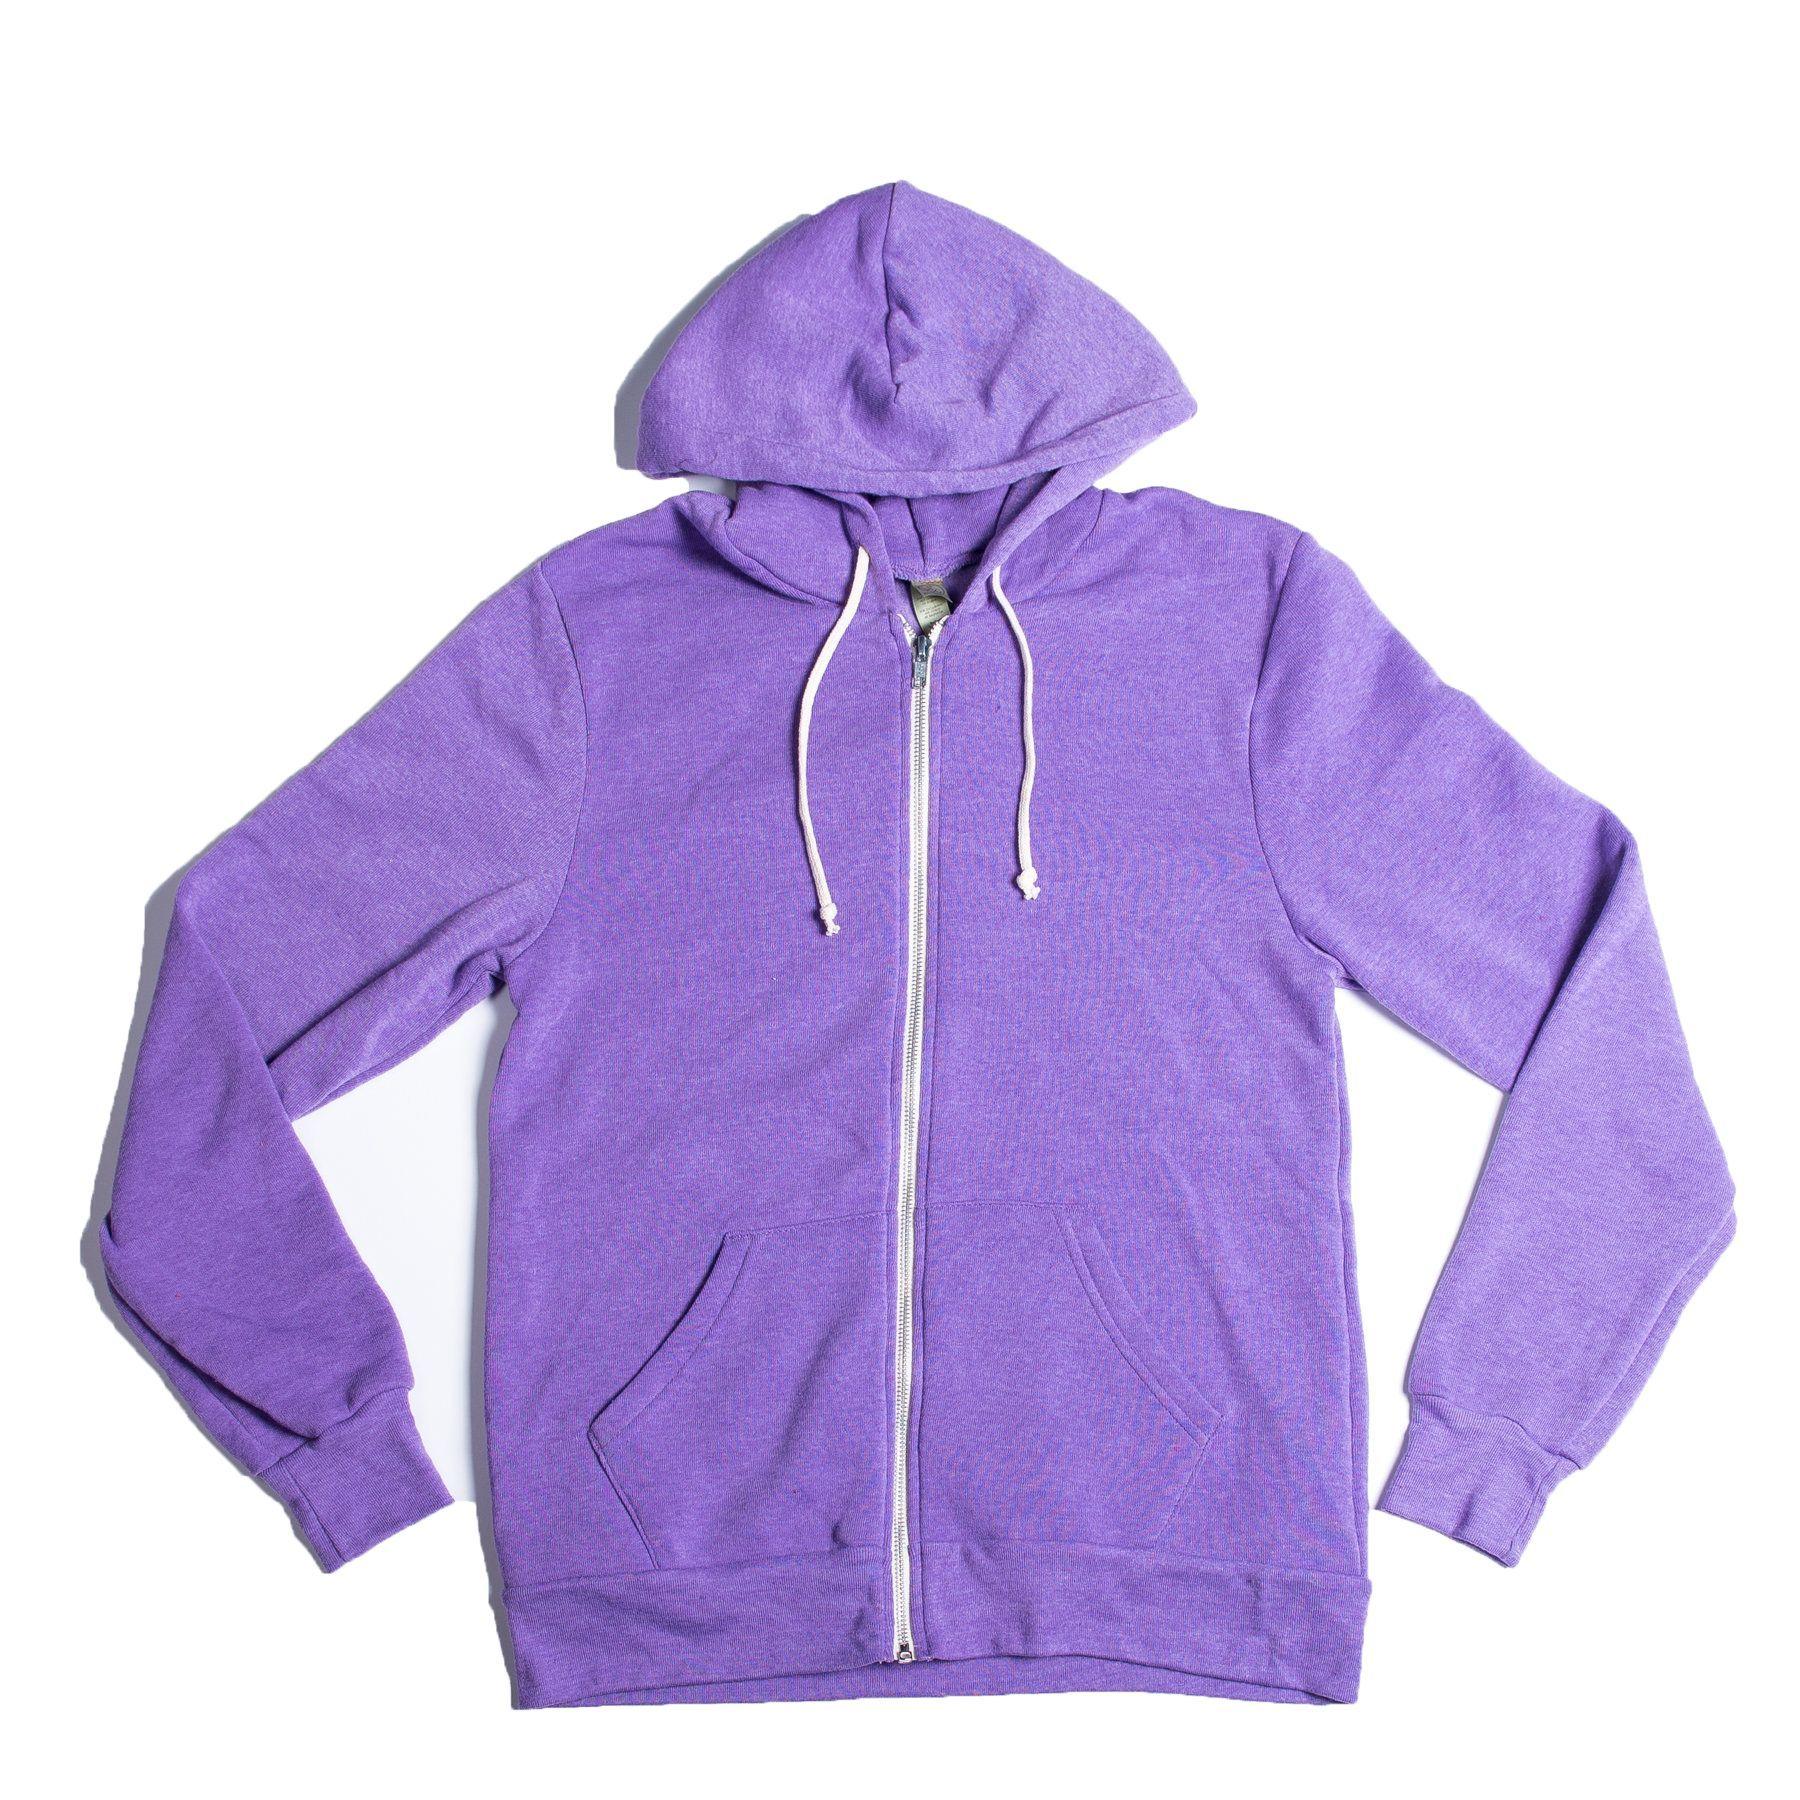 Rocky Unisex Zip Hoodie in Eco True Purple